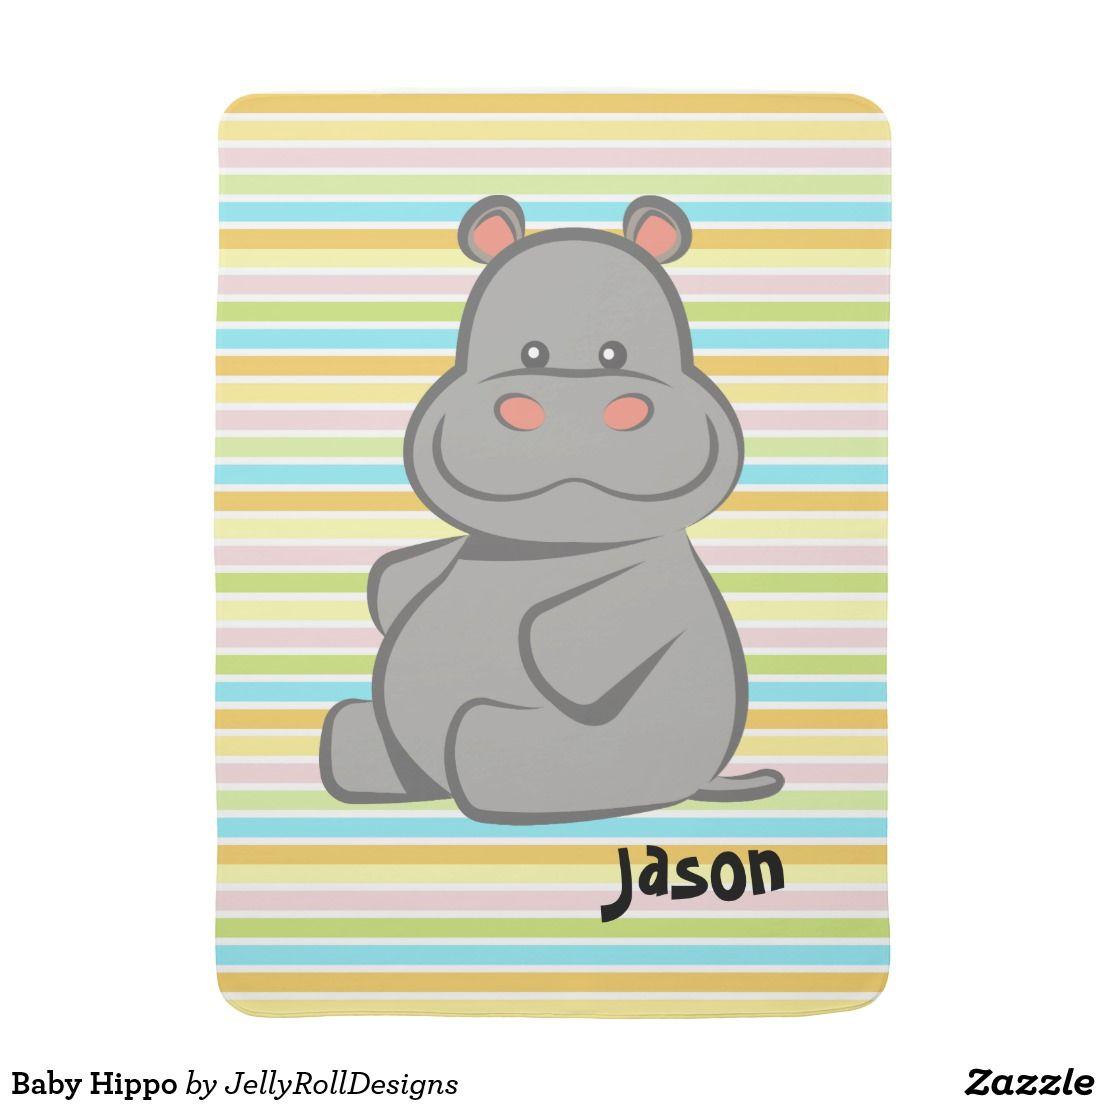 Baby Hippo Baby Blanket | Zazzle.com #babyhippo